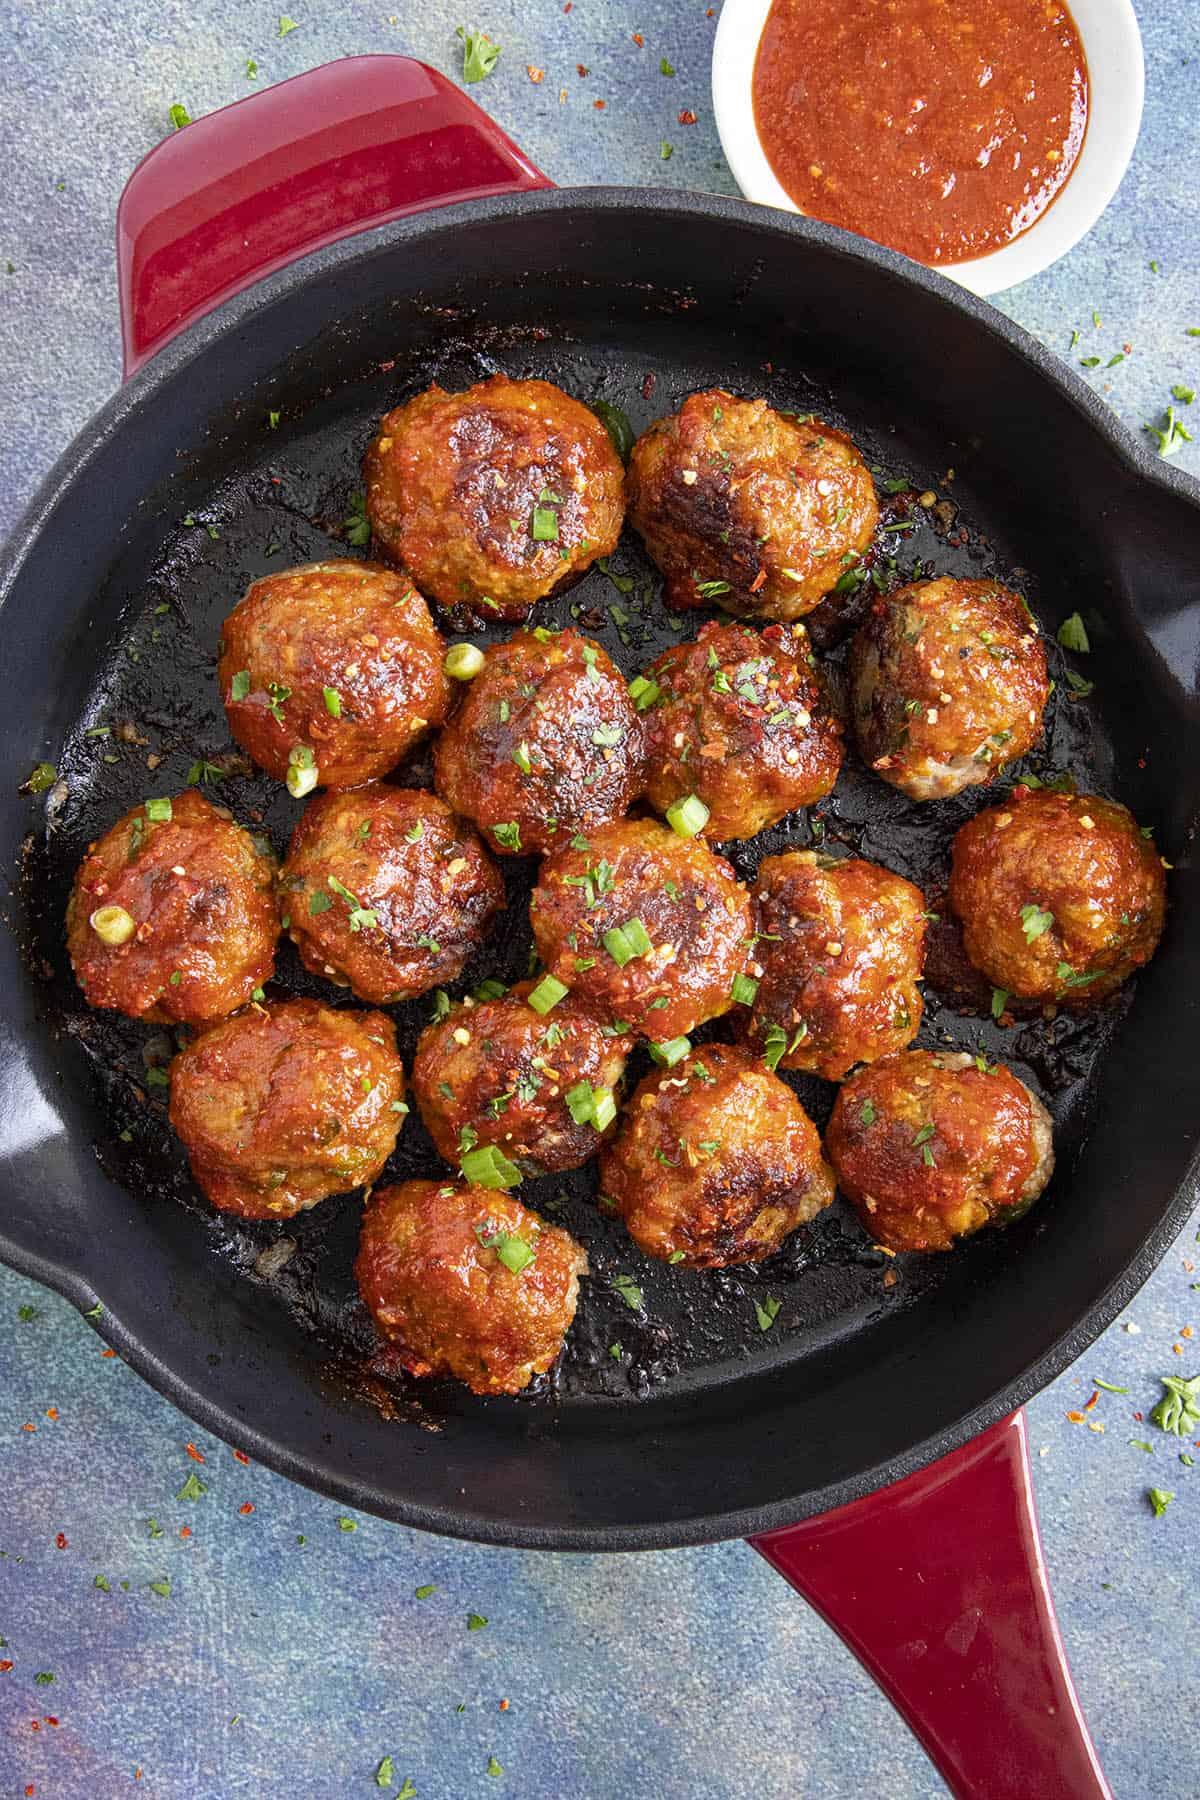 Honey Sriracha Turkey Meatballs ready to serve